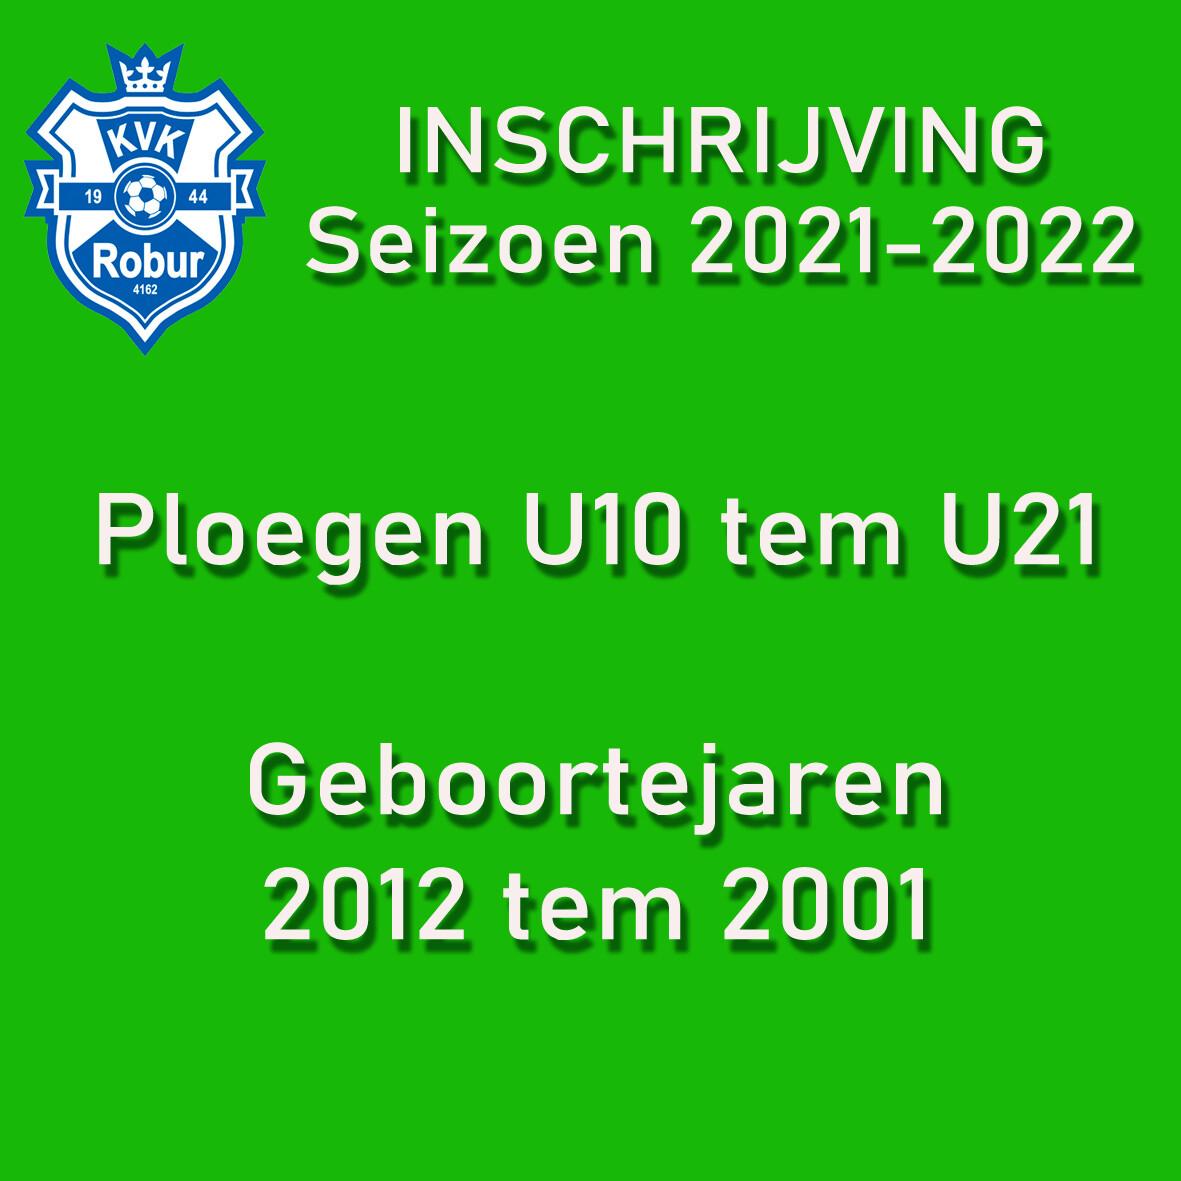 Inschrijving Seizoen 2021 - 2022 U10 tem U21